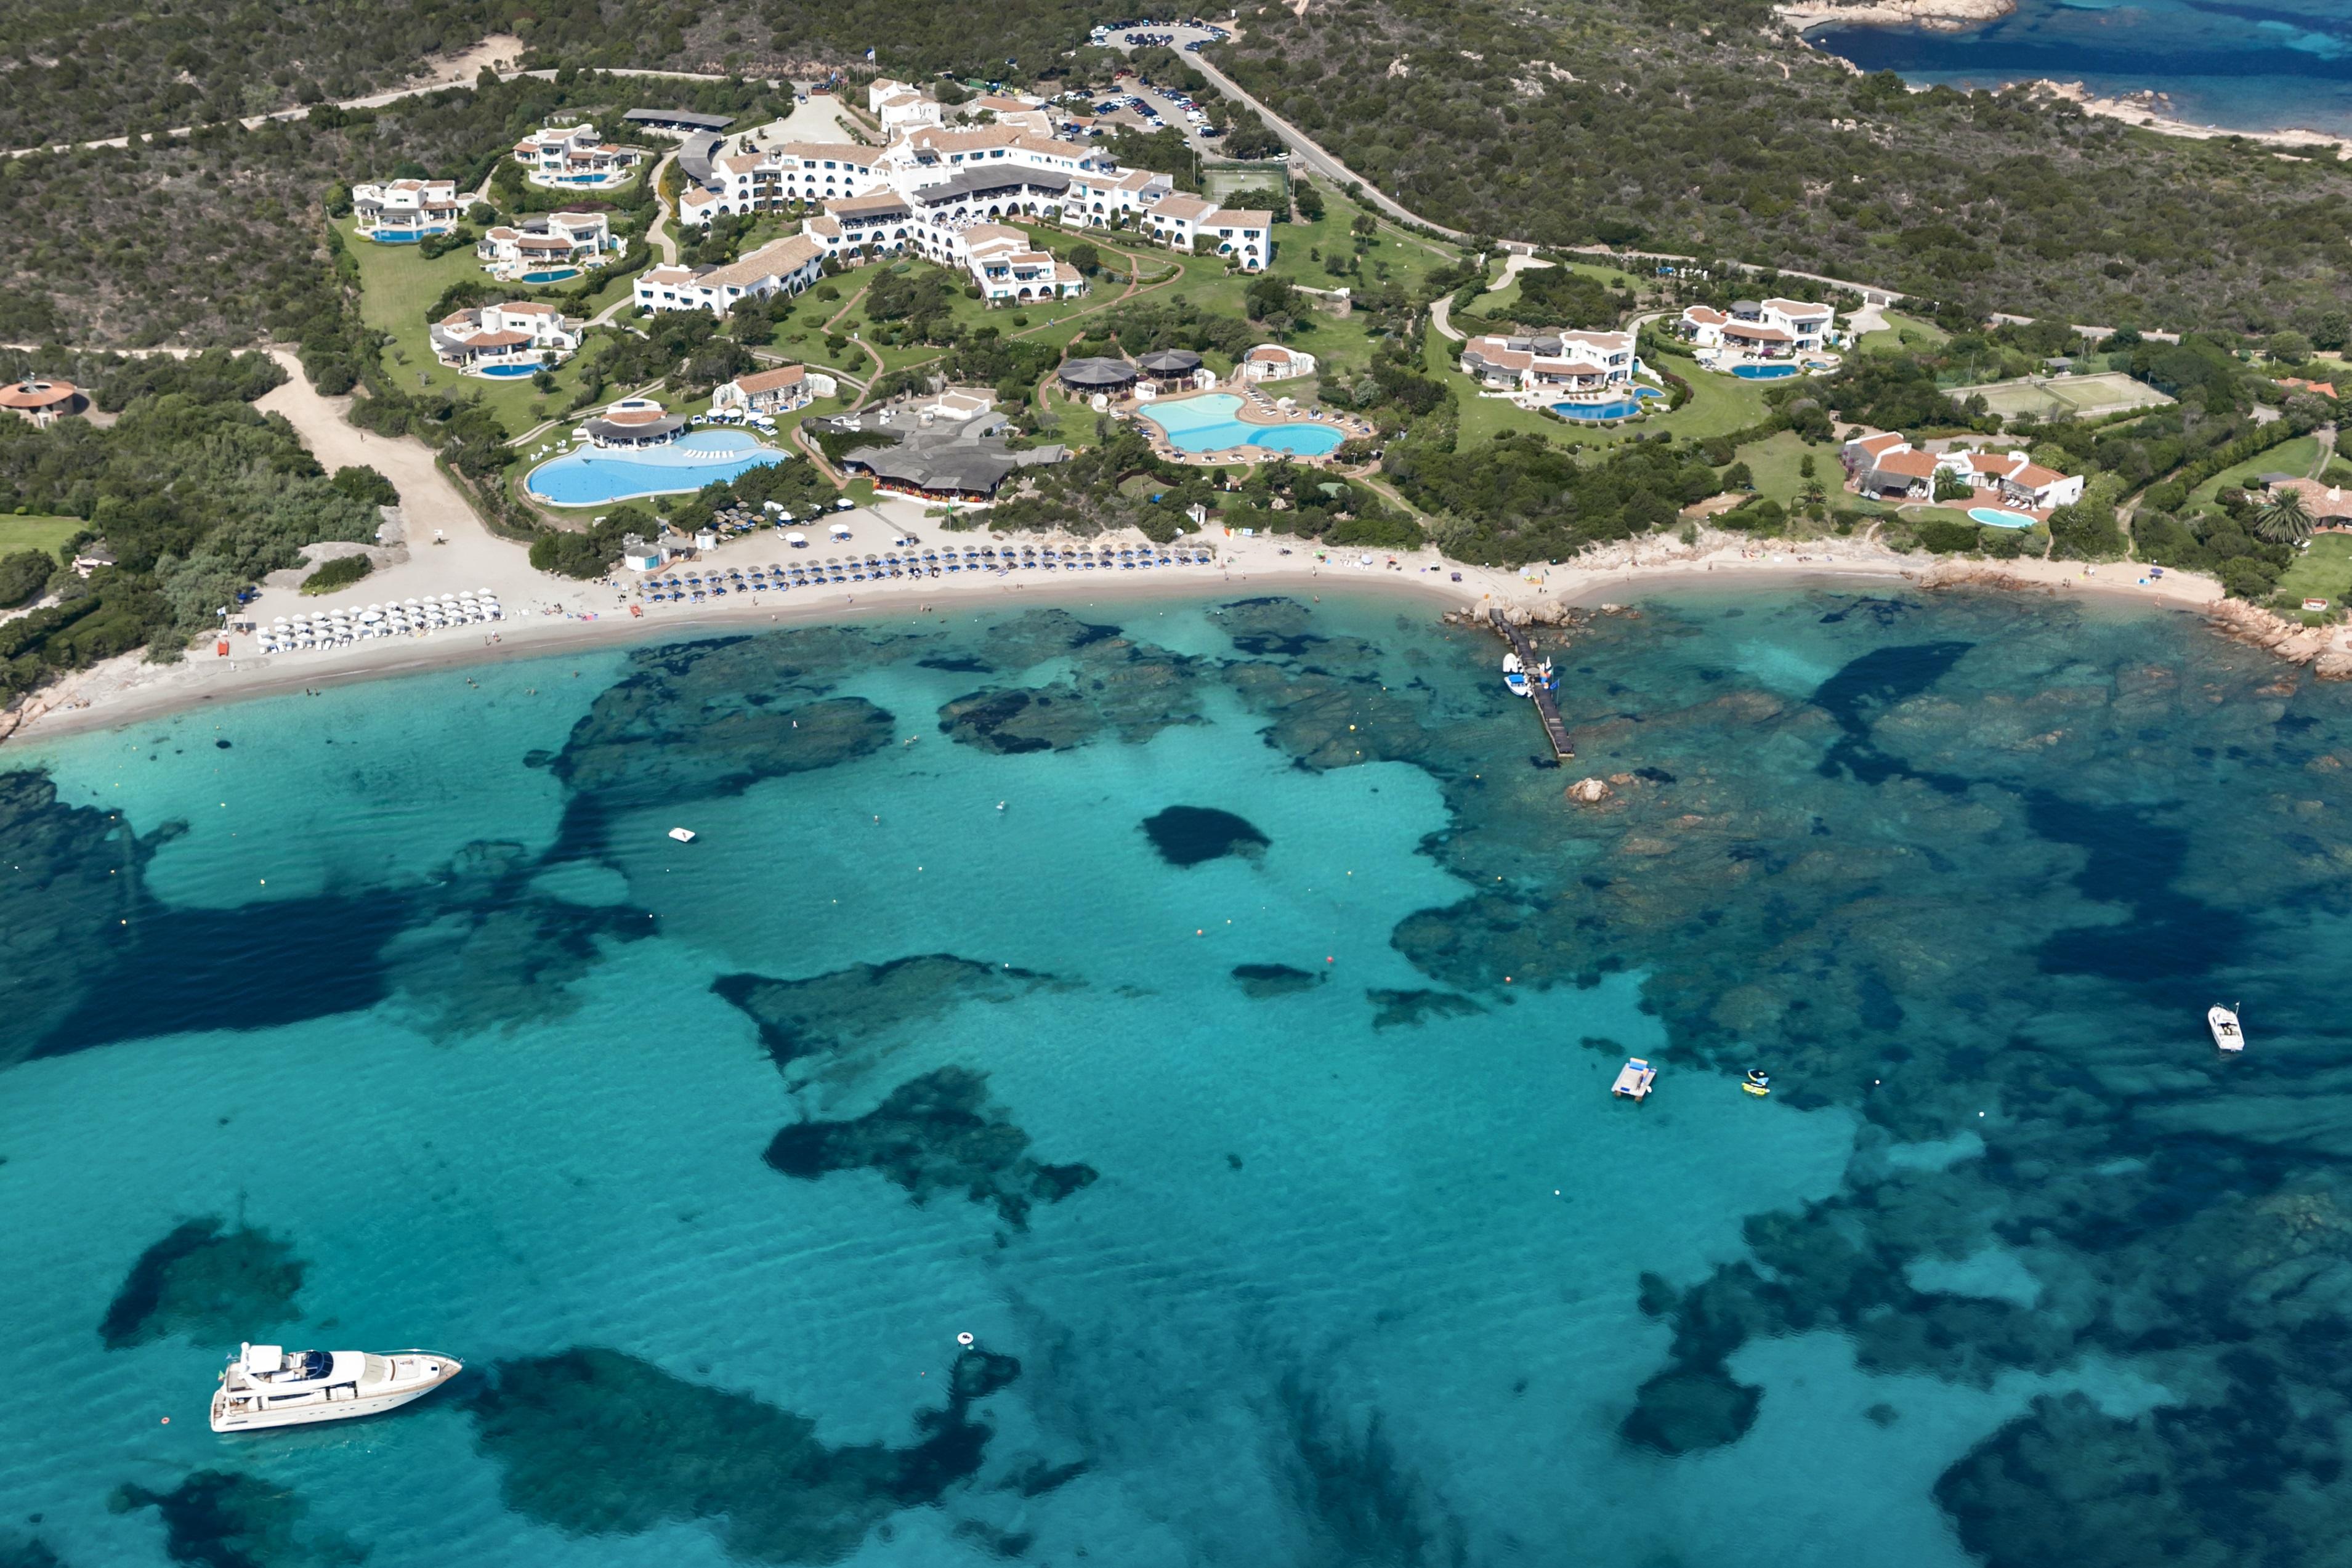 Hotel Romazzino - Aerial View